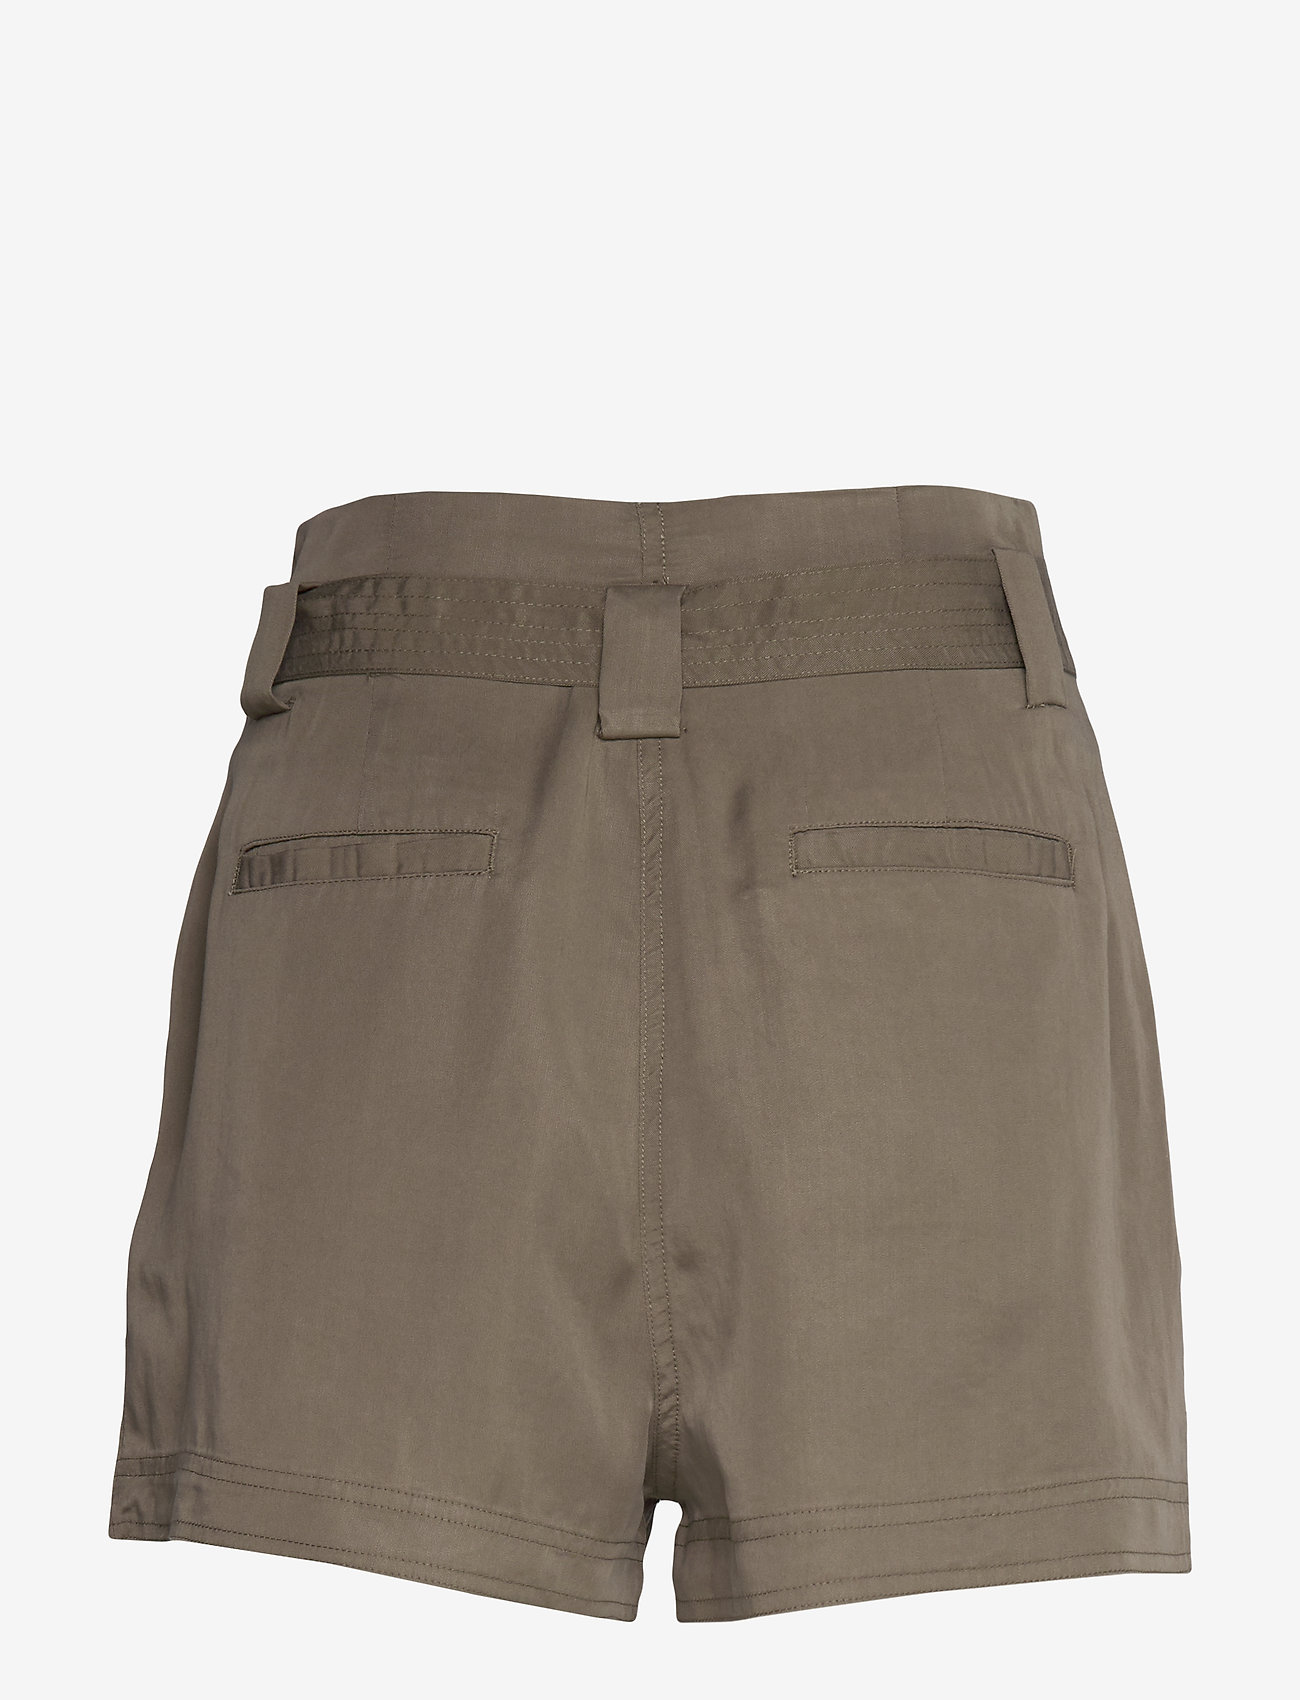 Superdry - DESERT PAPER BAG SHORT - casual shortsit - bungee cord - 1